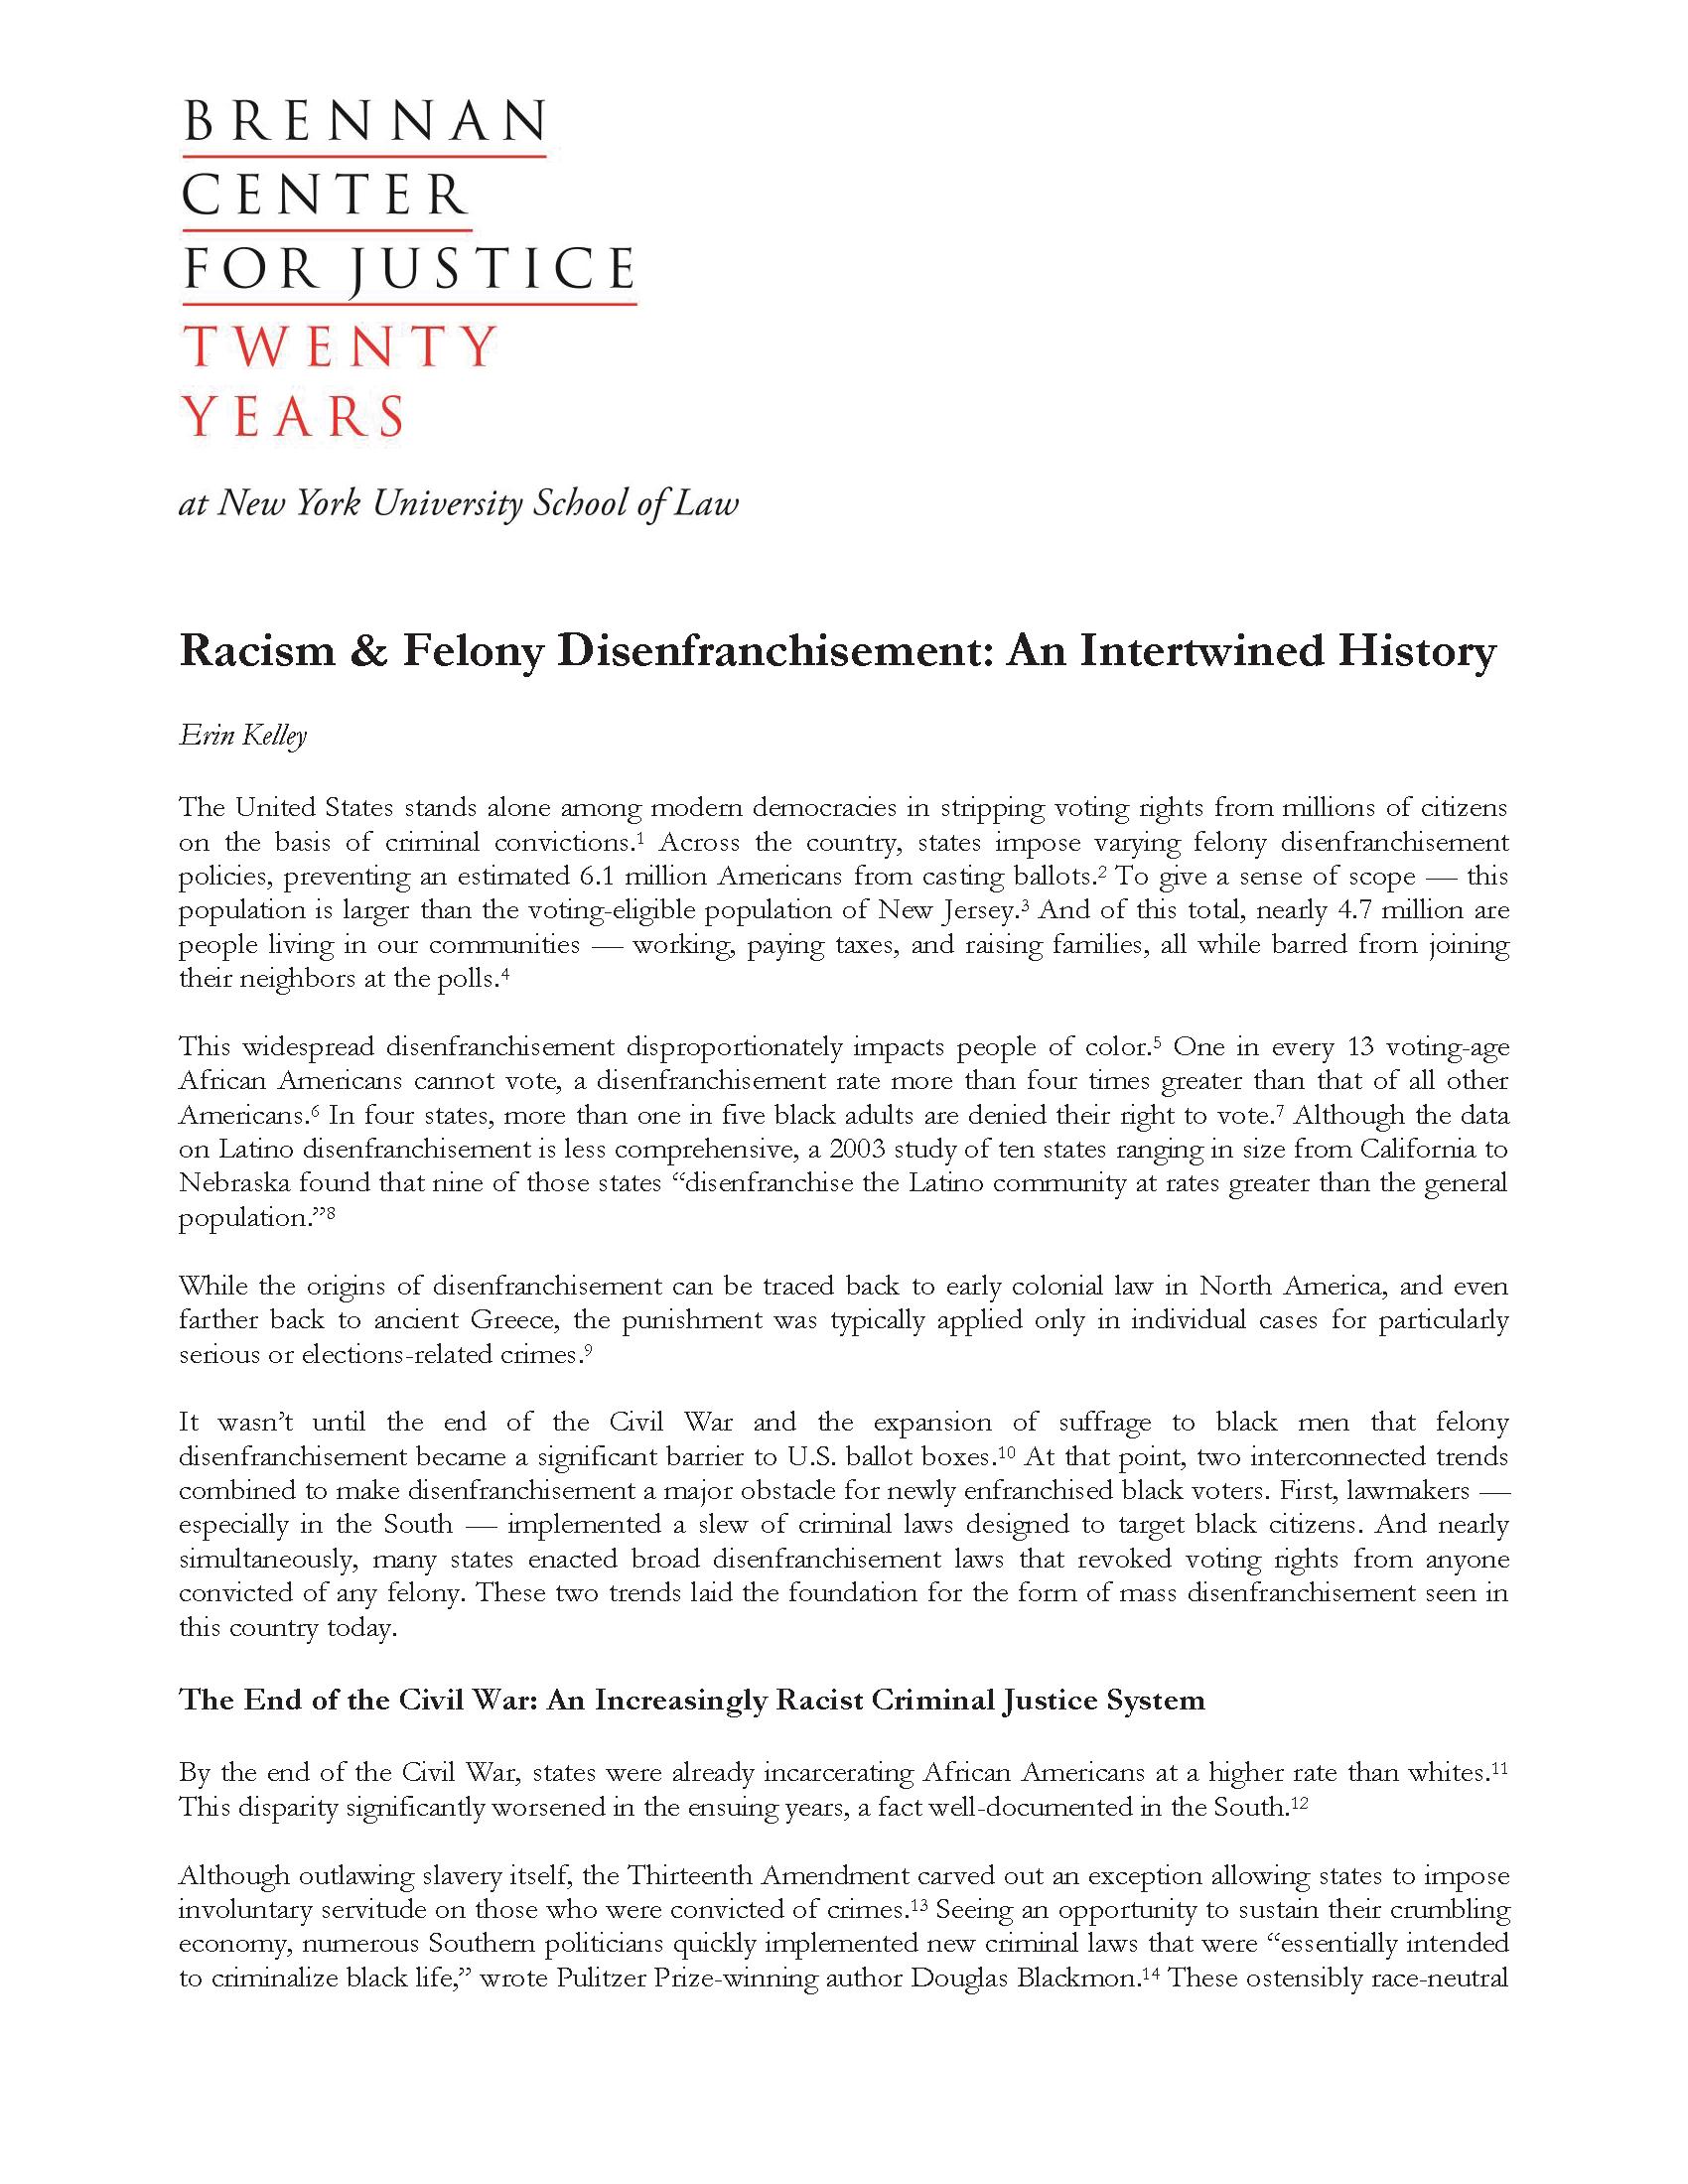 Racism Felony Disenfranchisement An Intertwined History Brennan